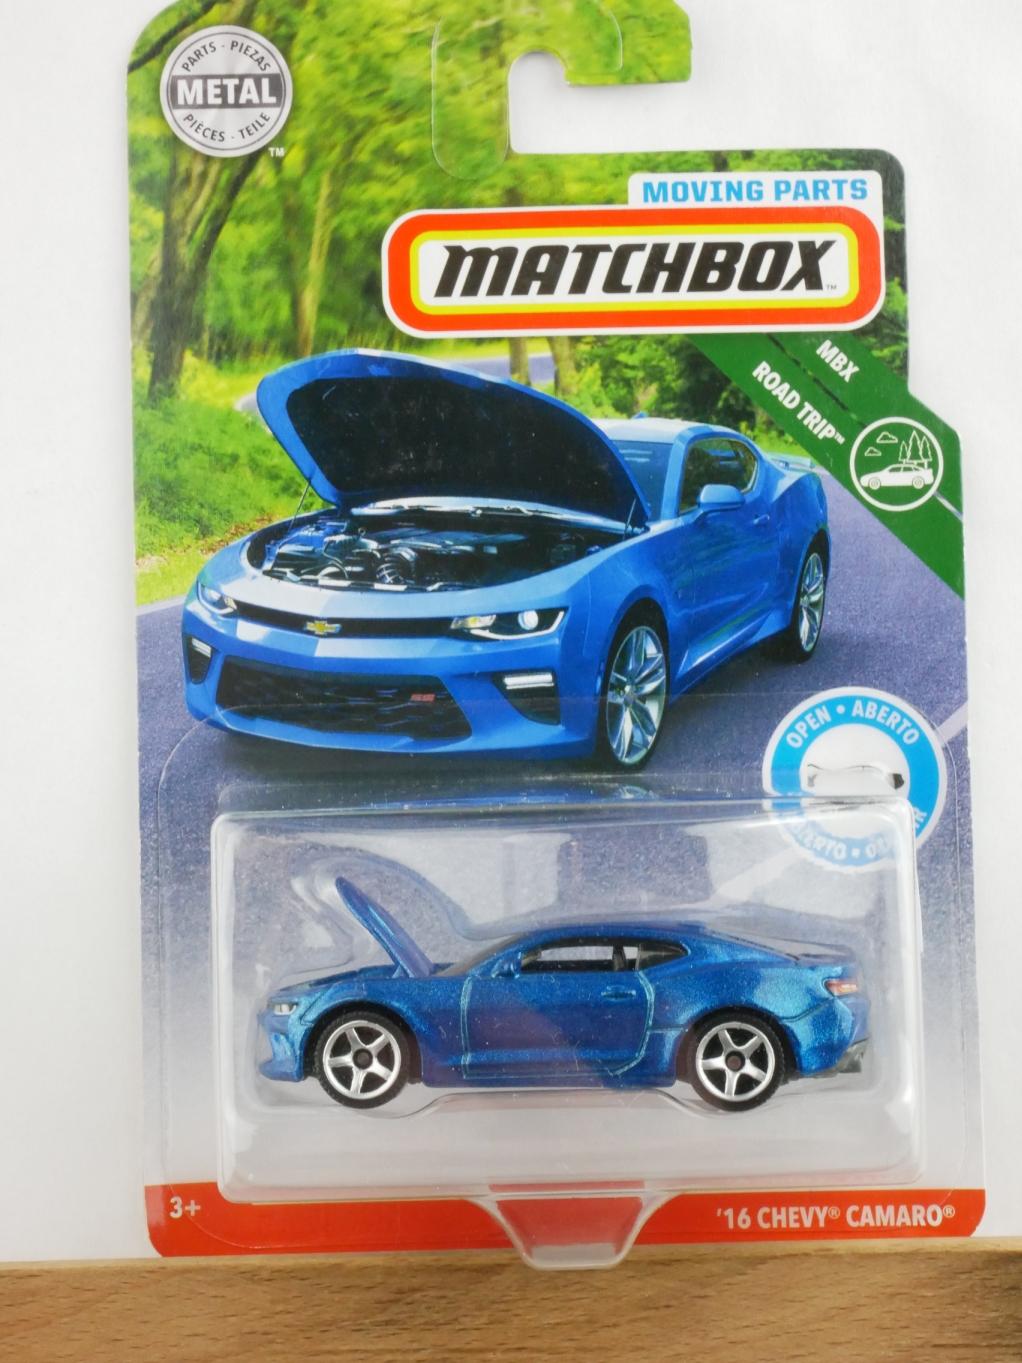 Matchbox Moving Parts '16 Chevy Camaro - 13559